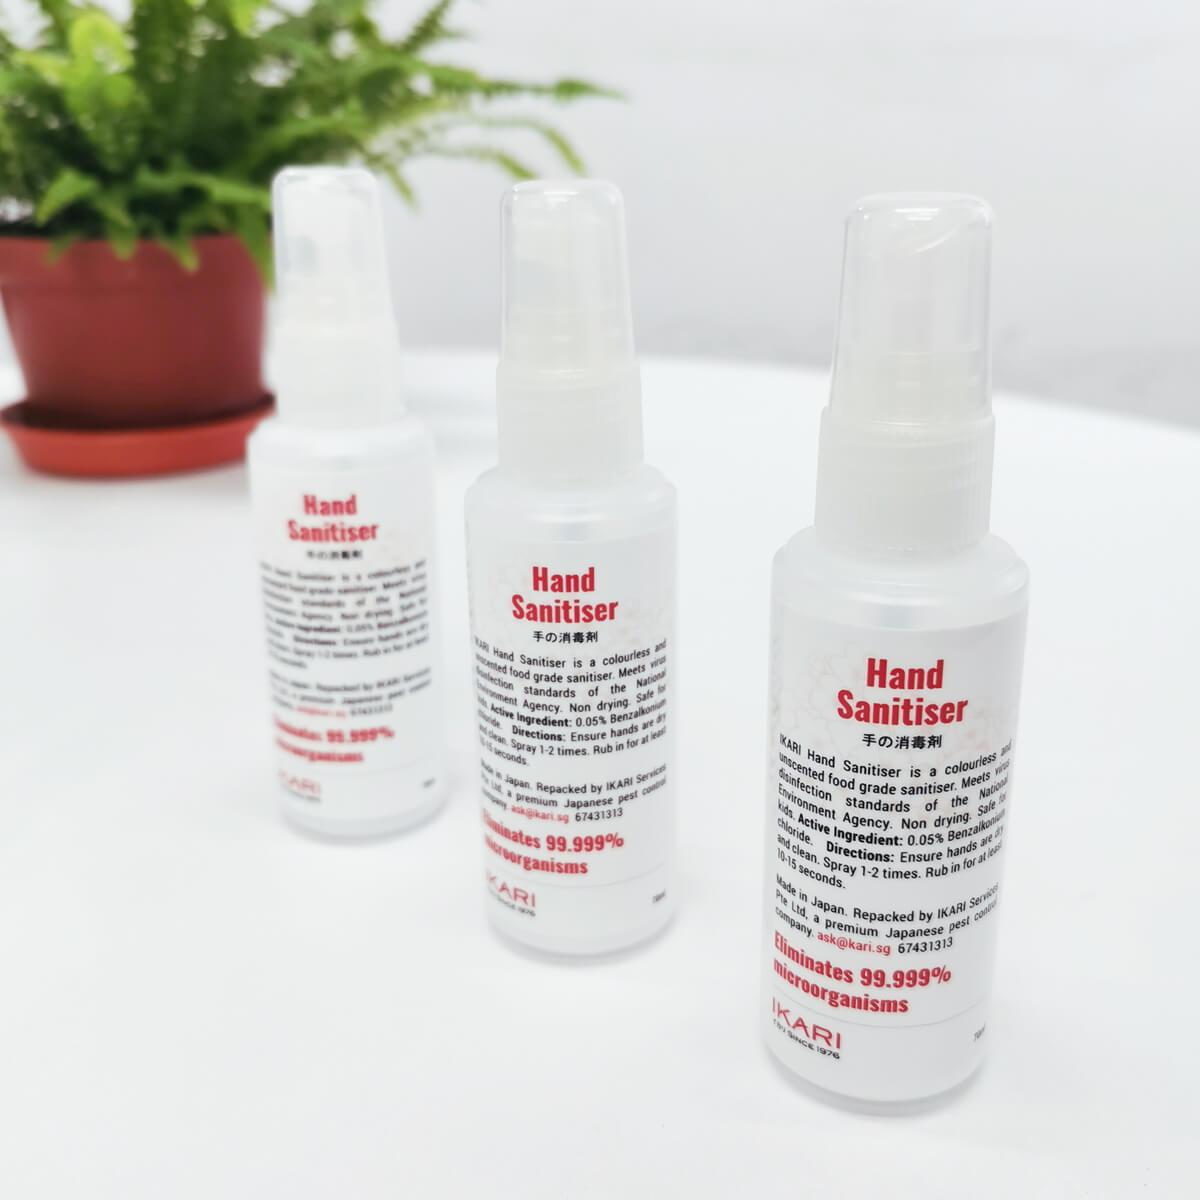 IKARI-hand-sanitiser-real